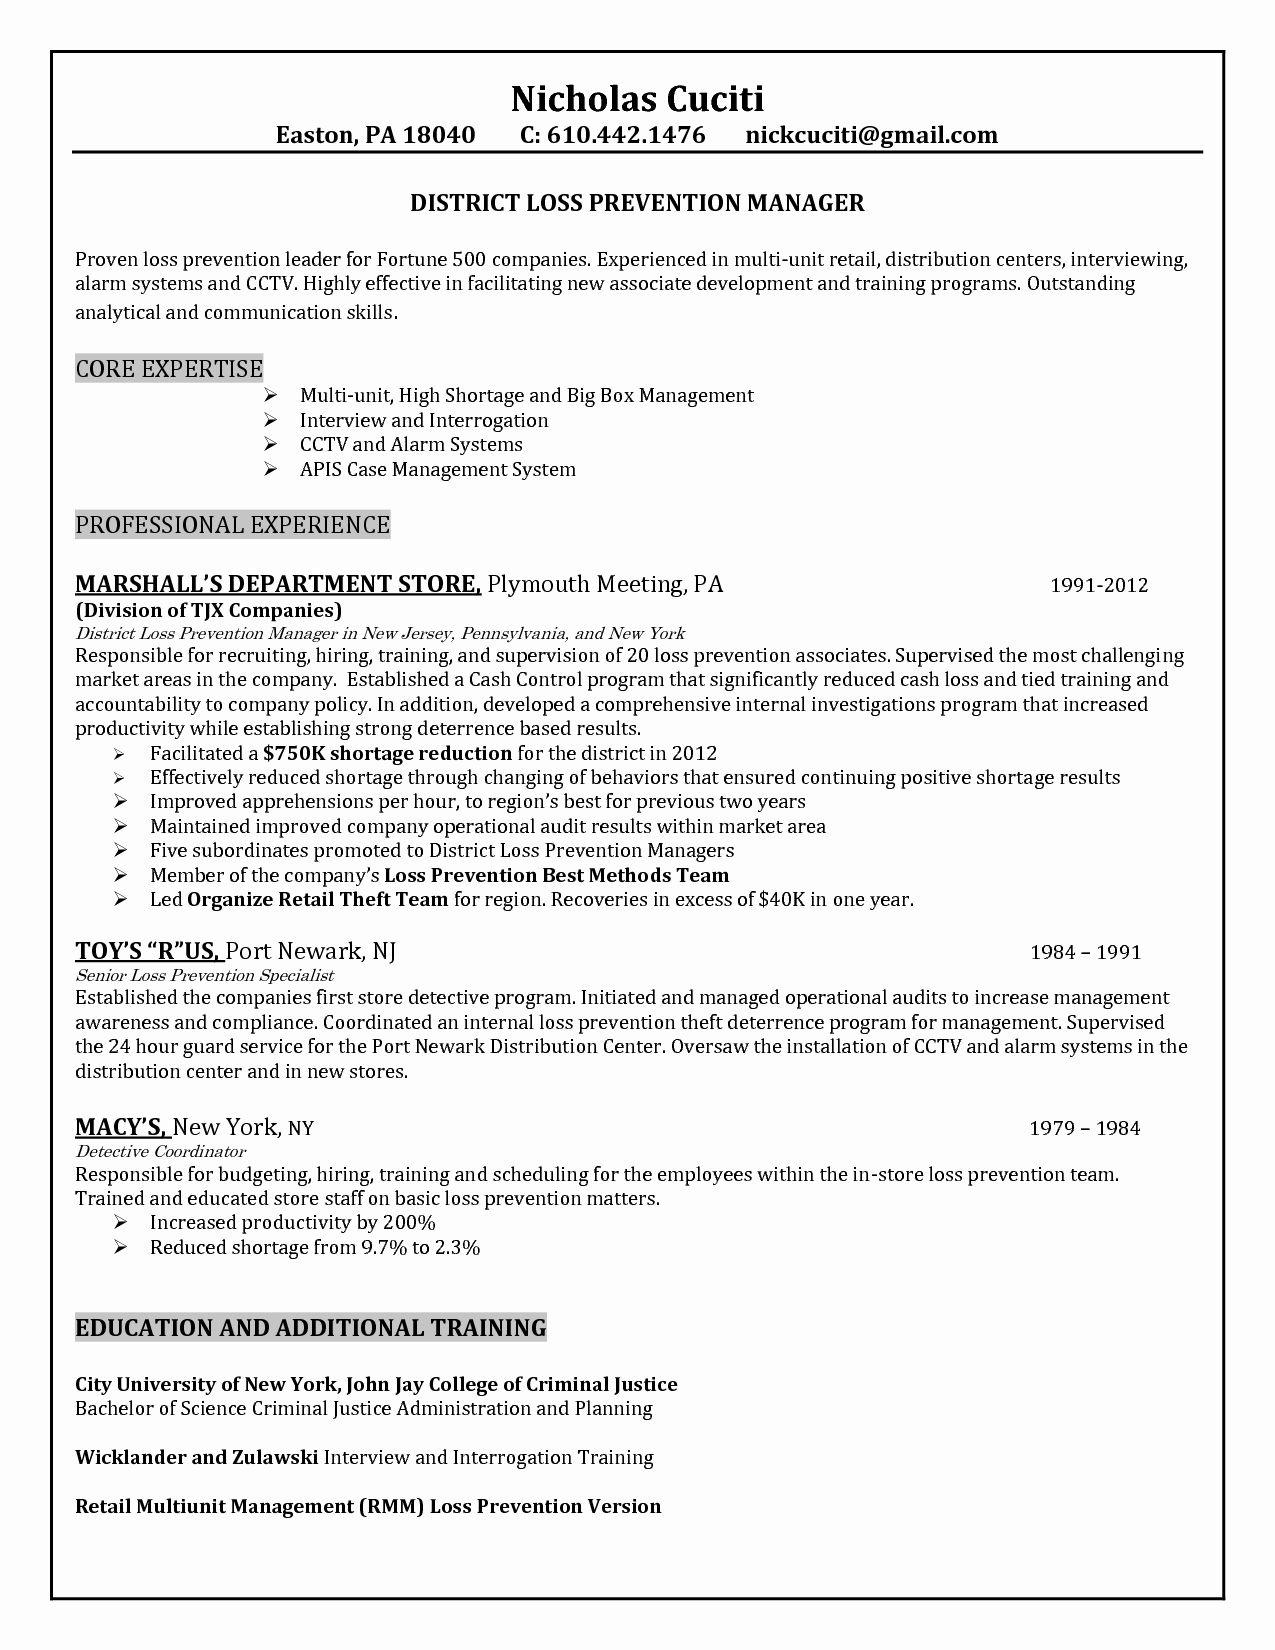 Best Of Car Salesman Responsibilities Kayskehauk Resume Examples Job Resume Examples Security Guard Jobs